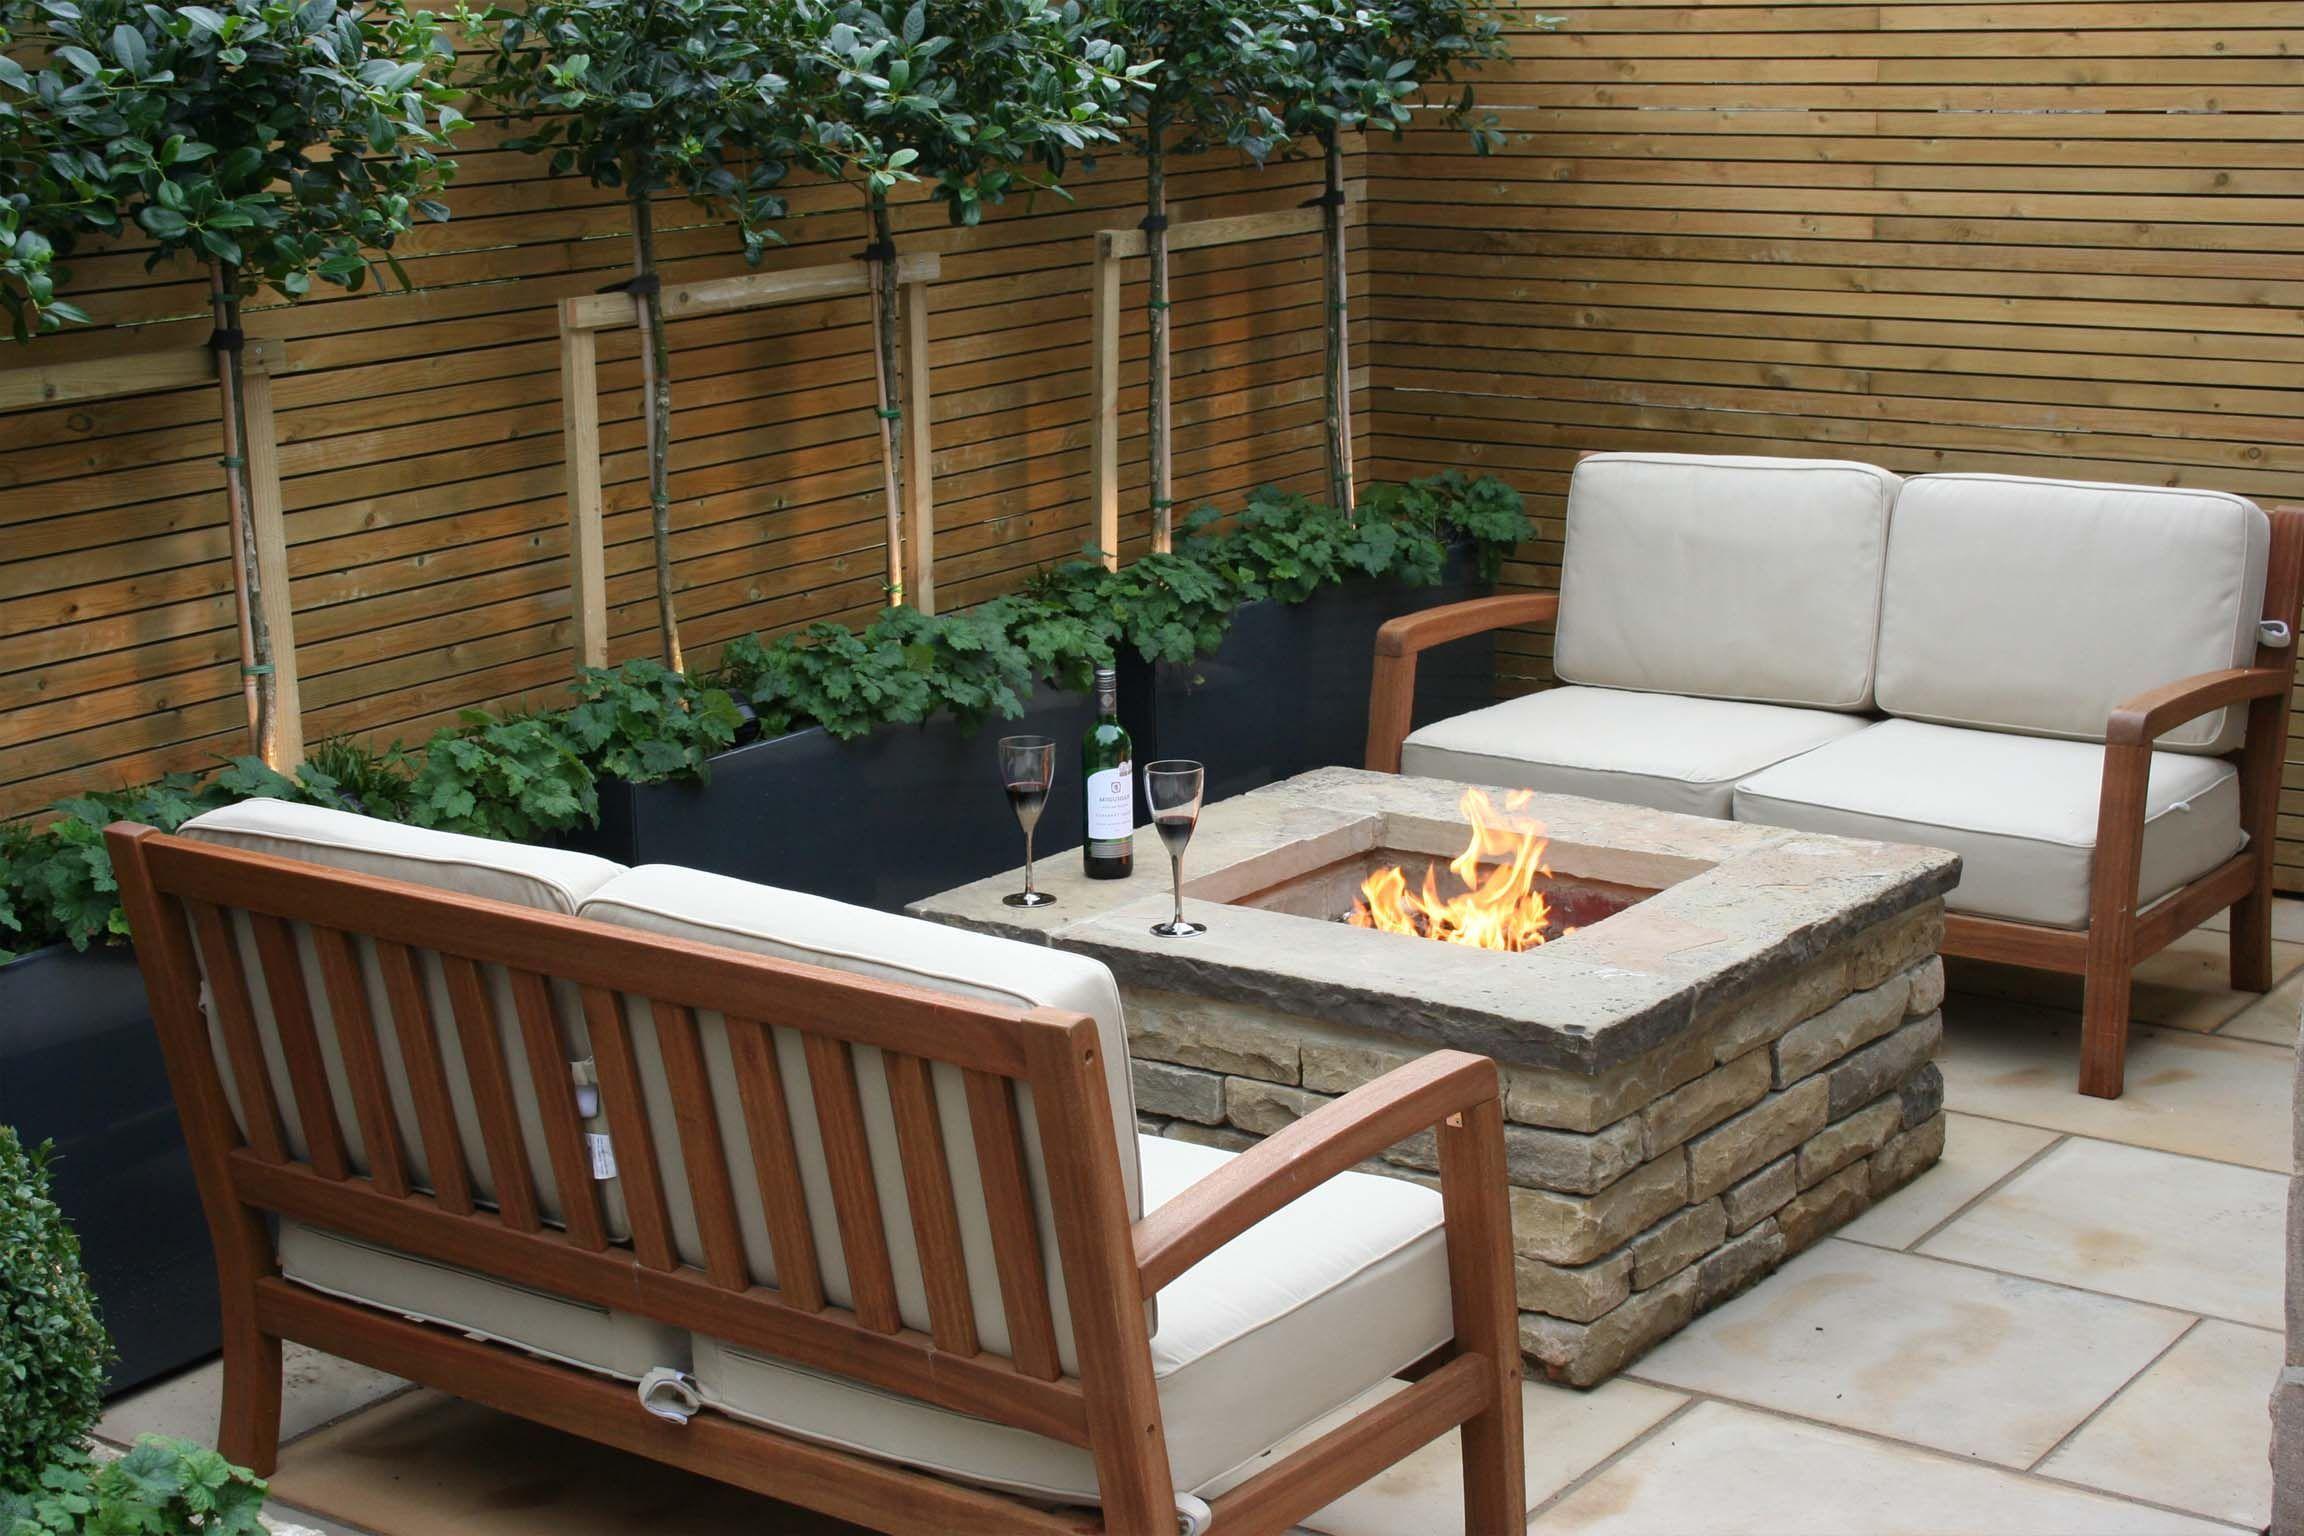 Urban chic courtyard garden outdoor fire pit outdoor sofas bestall co evergreen planting sawn stone